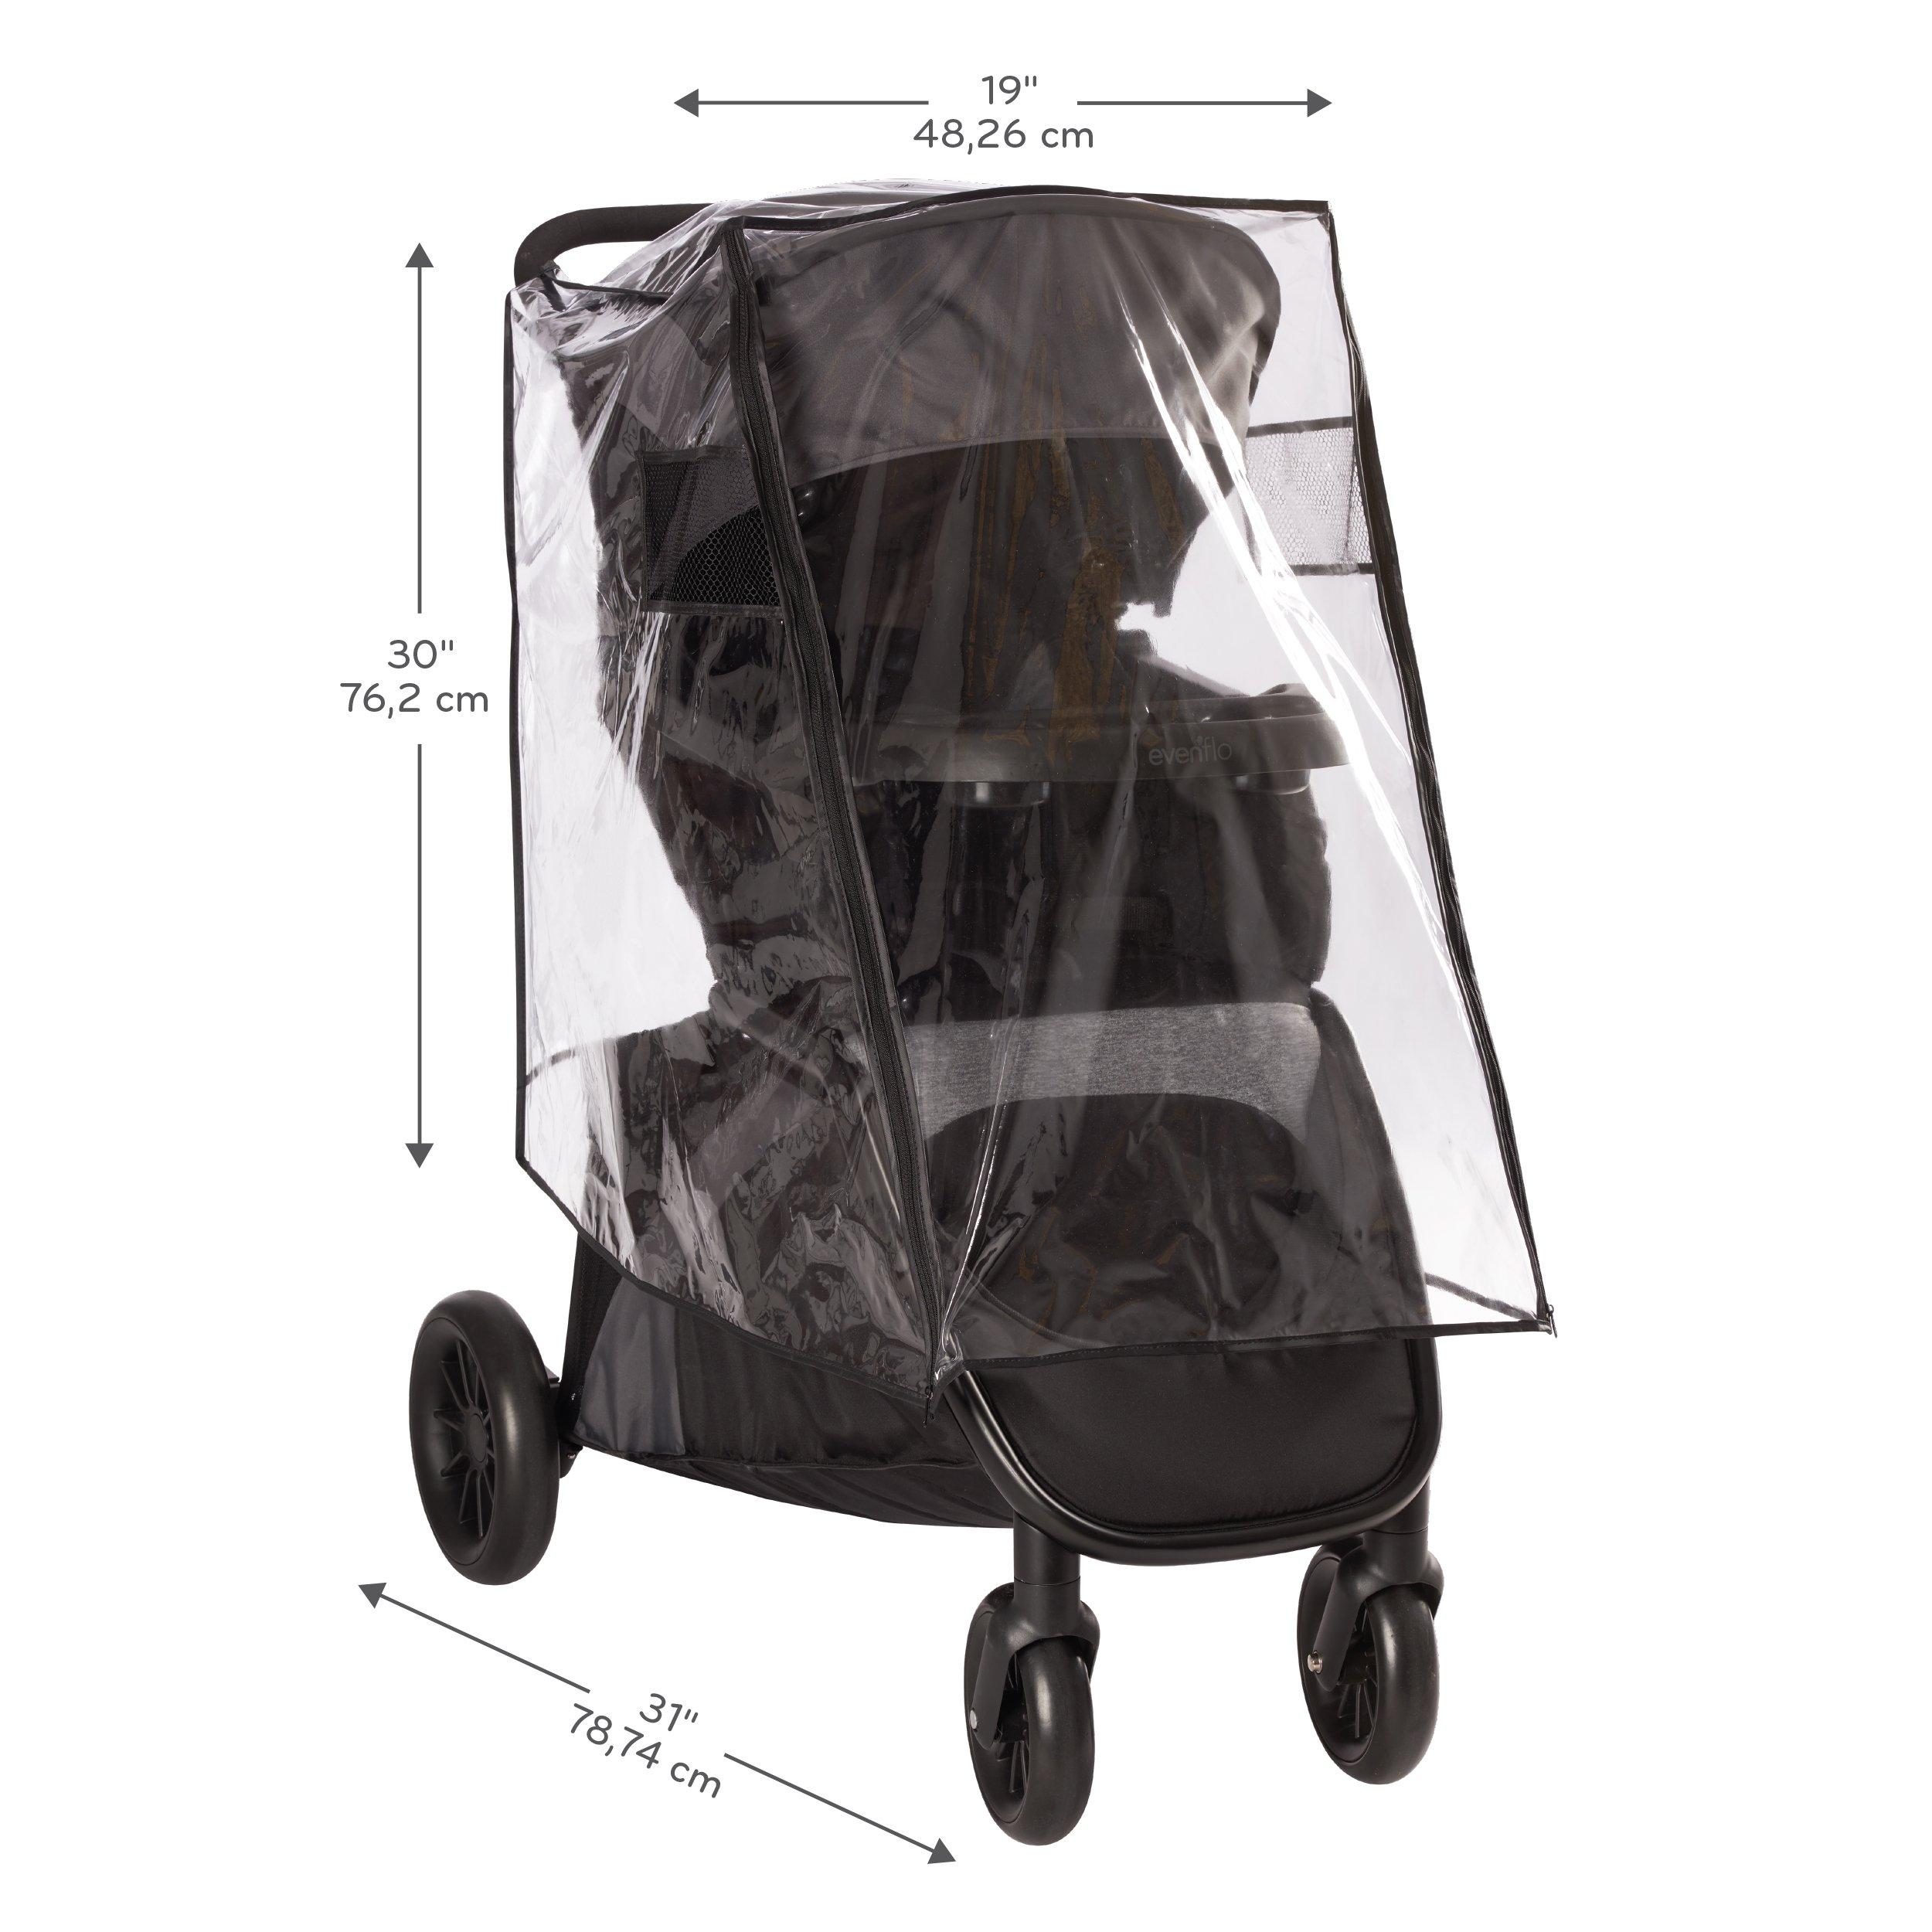 Evenflo Stroller Accessories Starter Kit by Evenflo (Image #5)